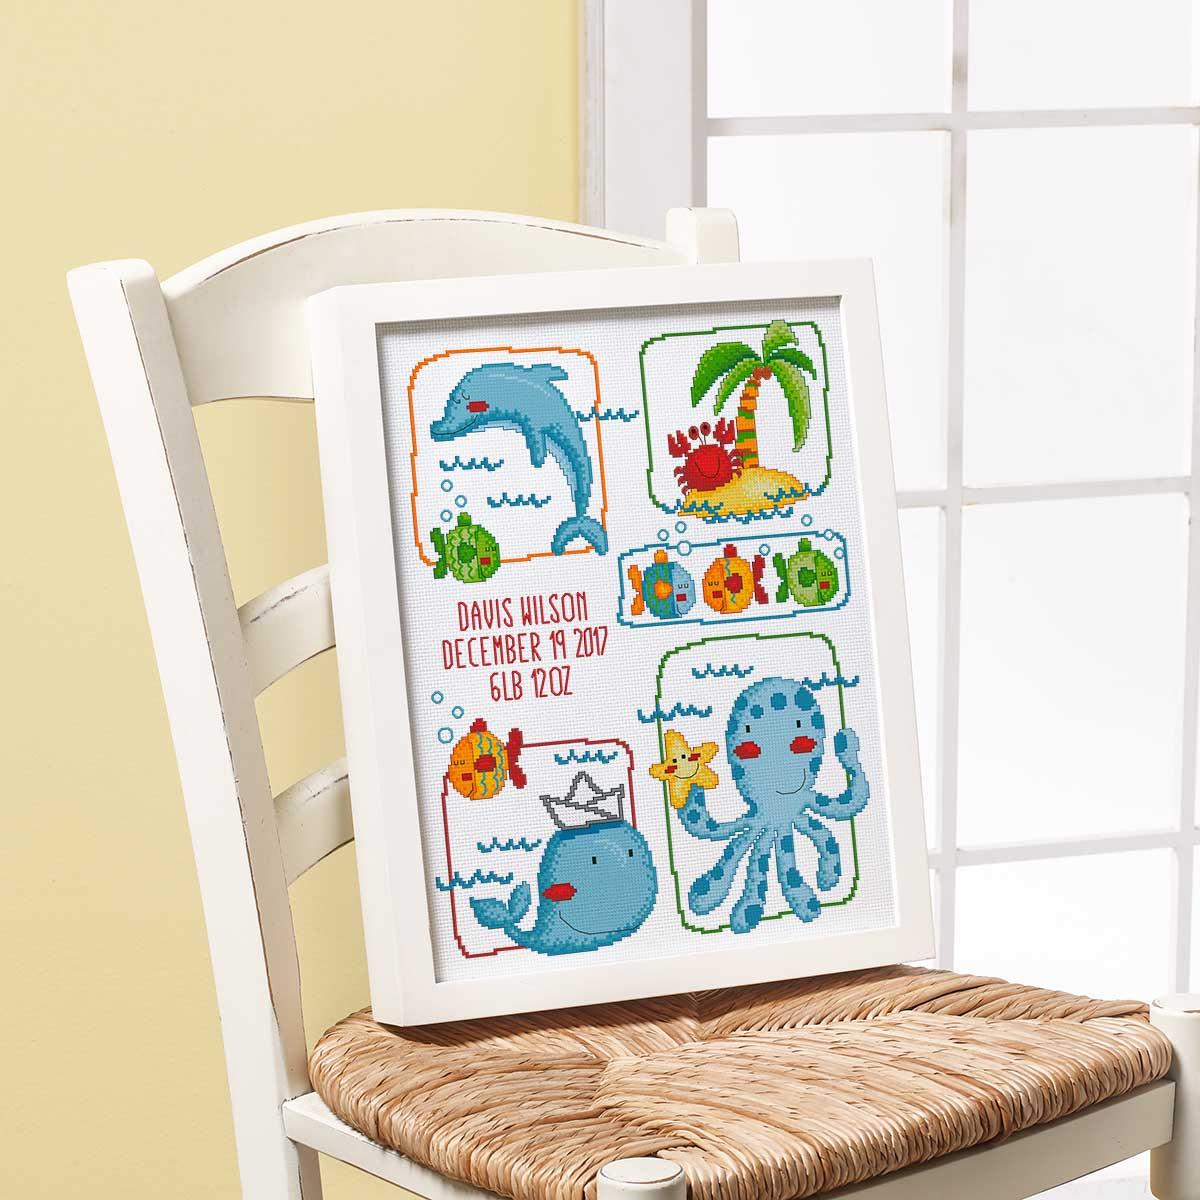 Bucilla ® Baby - Counted Cross Stitch - Crib Ensembles - Sea Life - Birth Record Kit